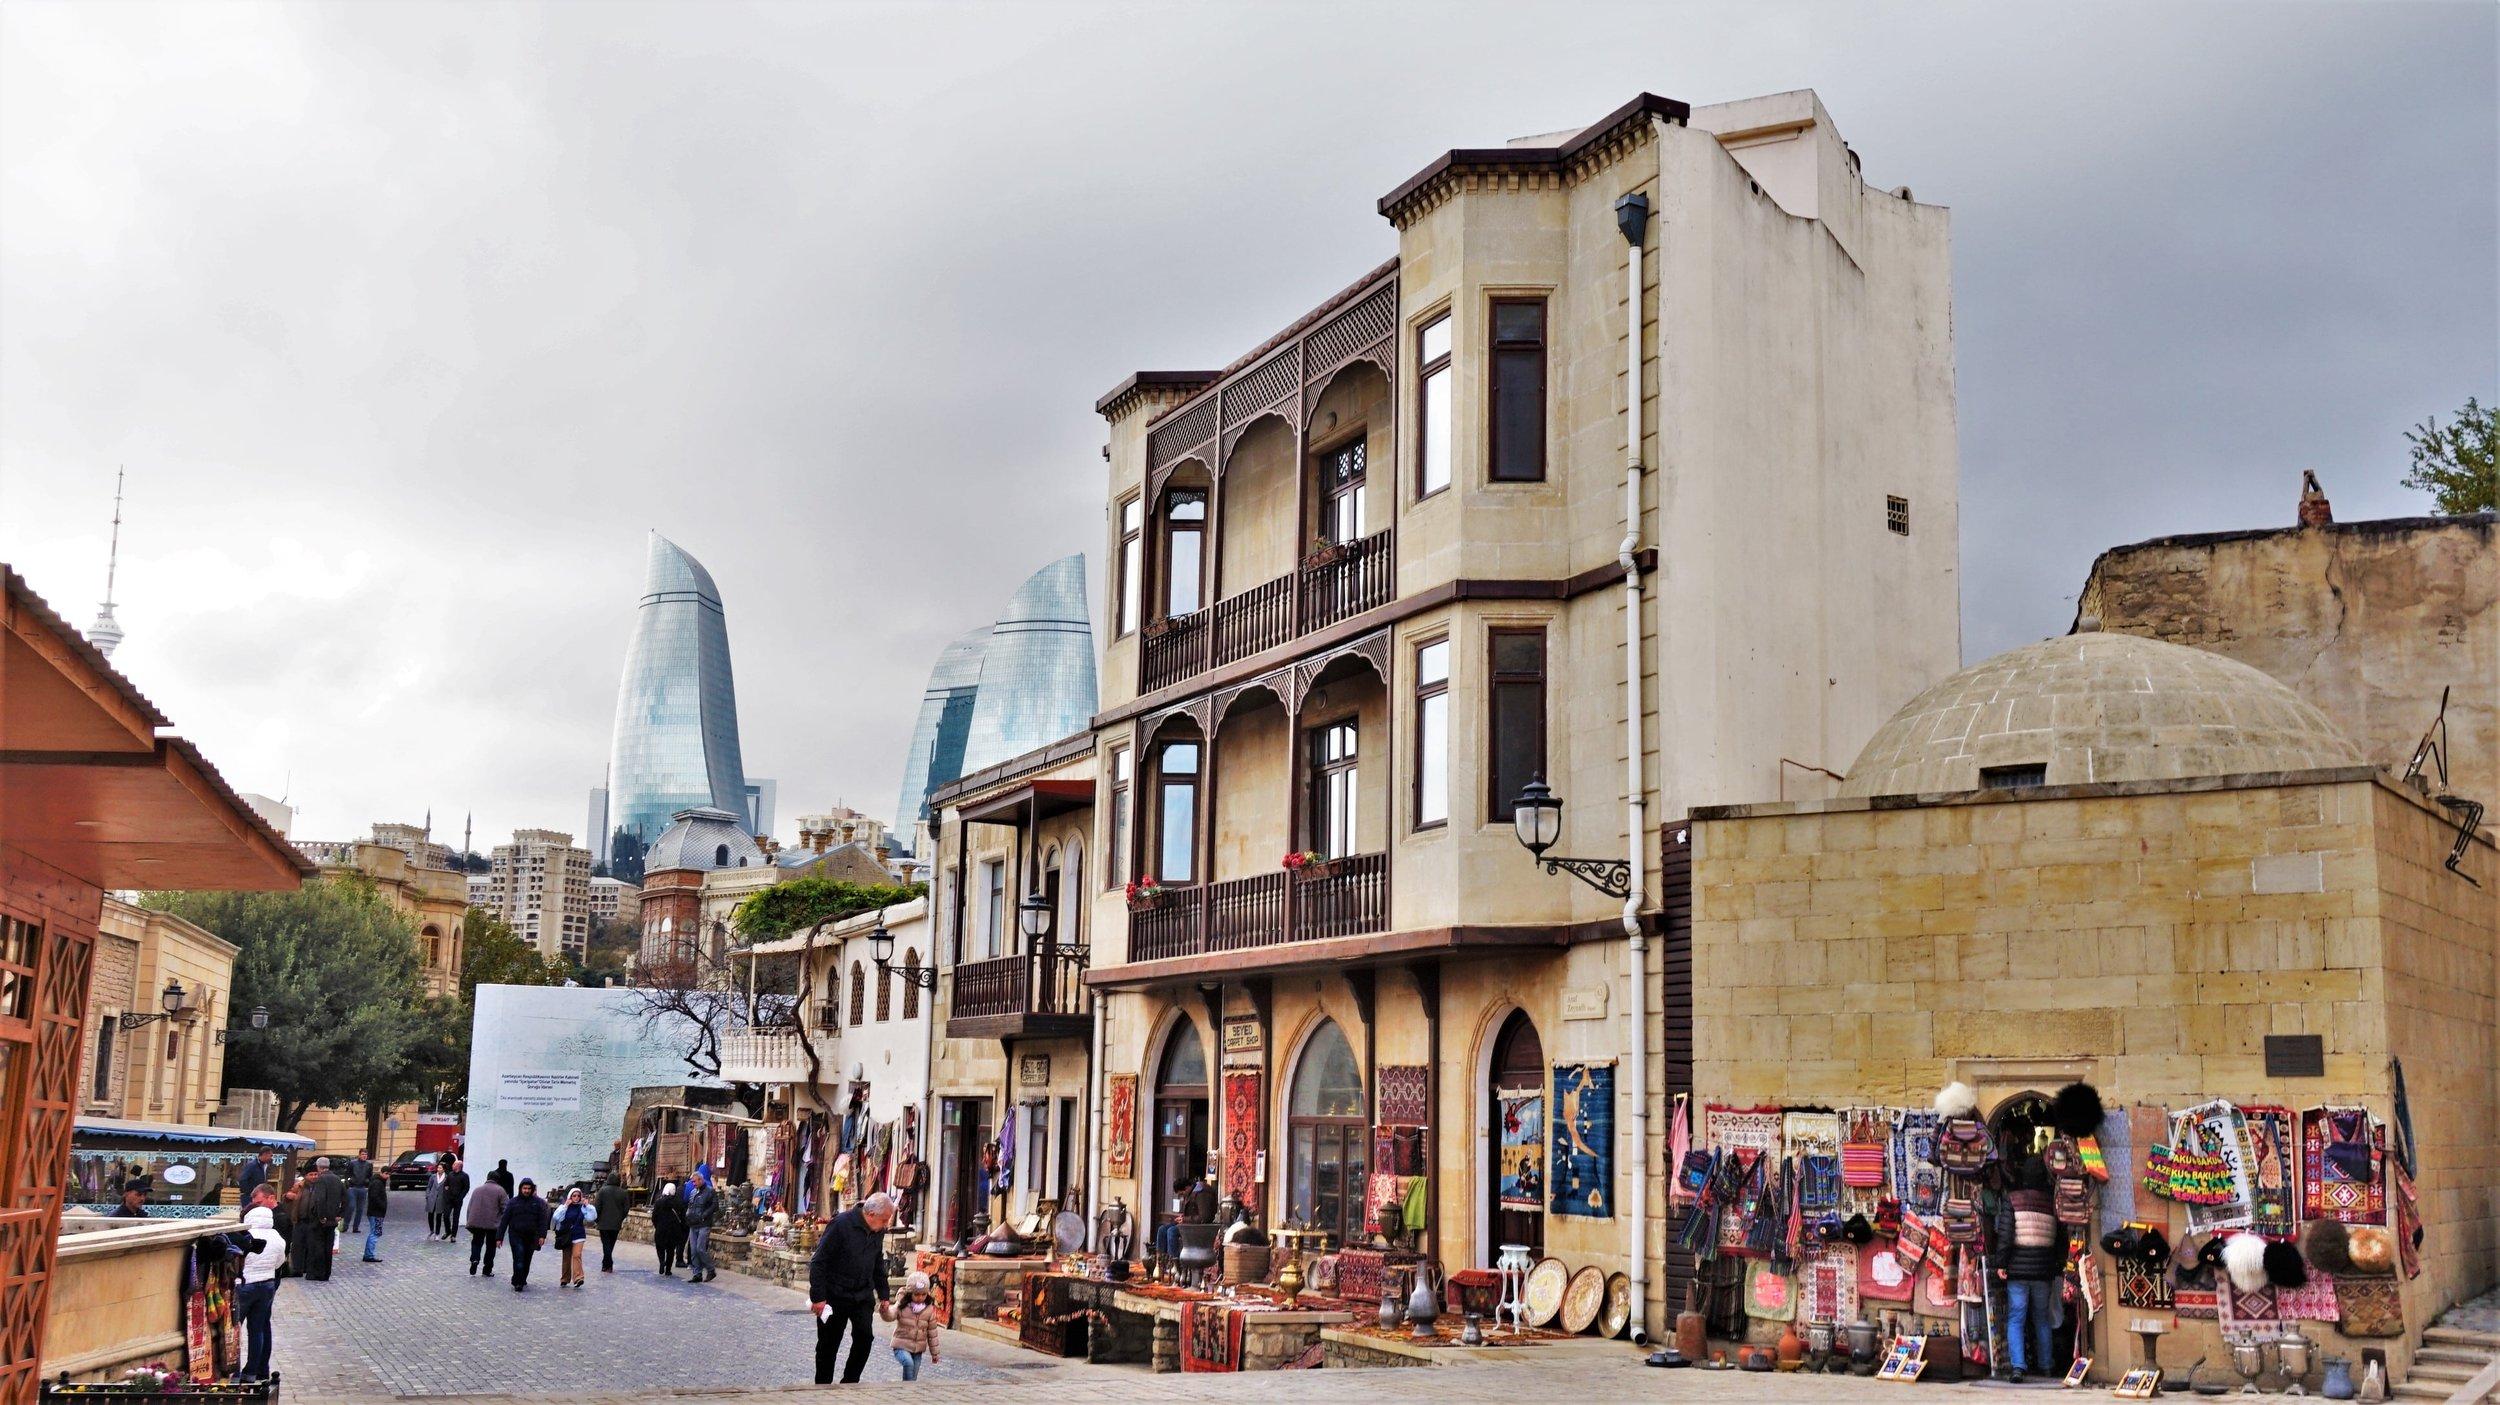 baku azerbijan 2 day itinerary